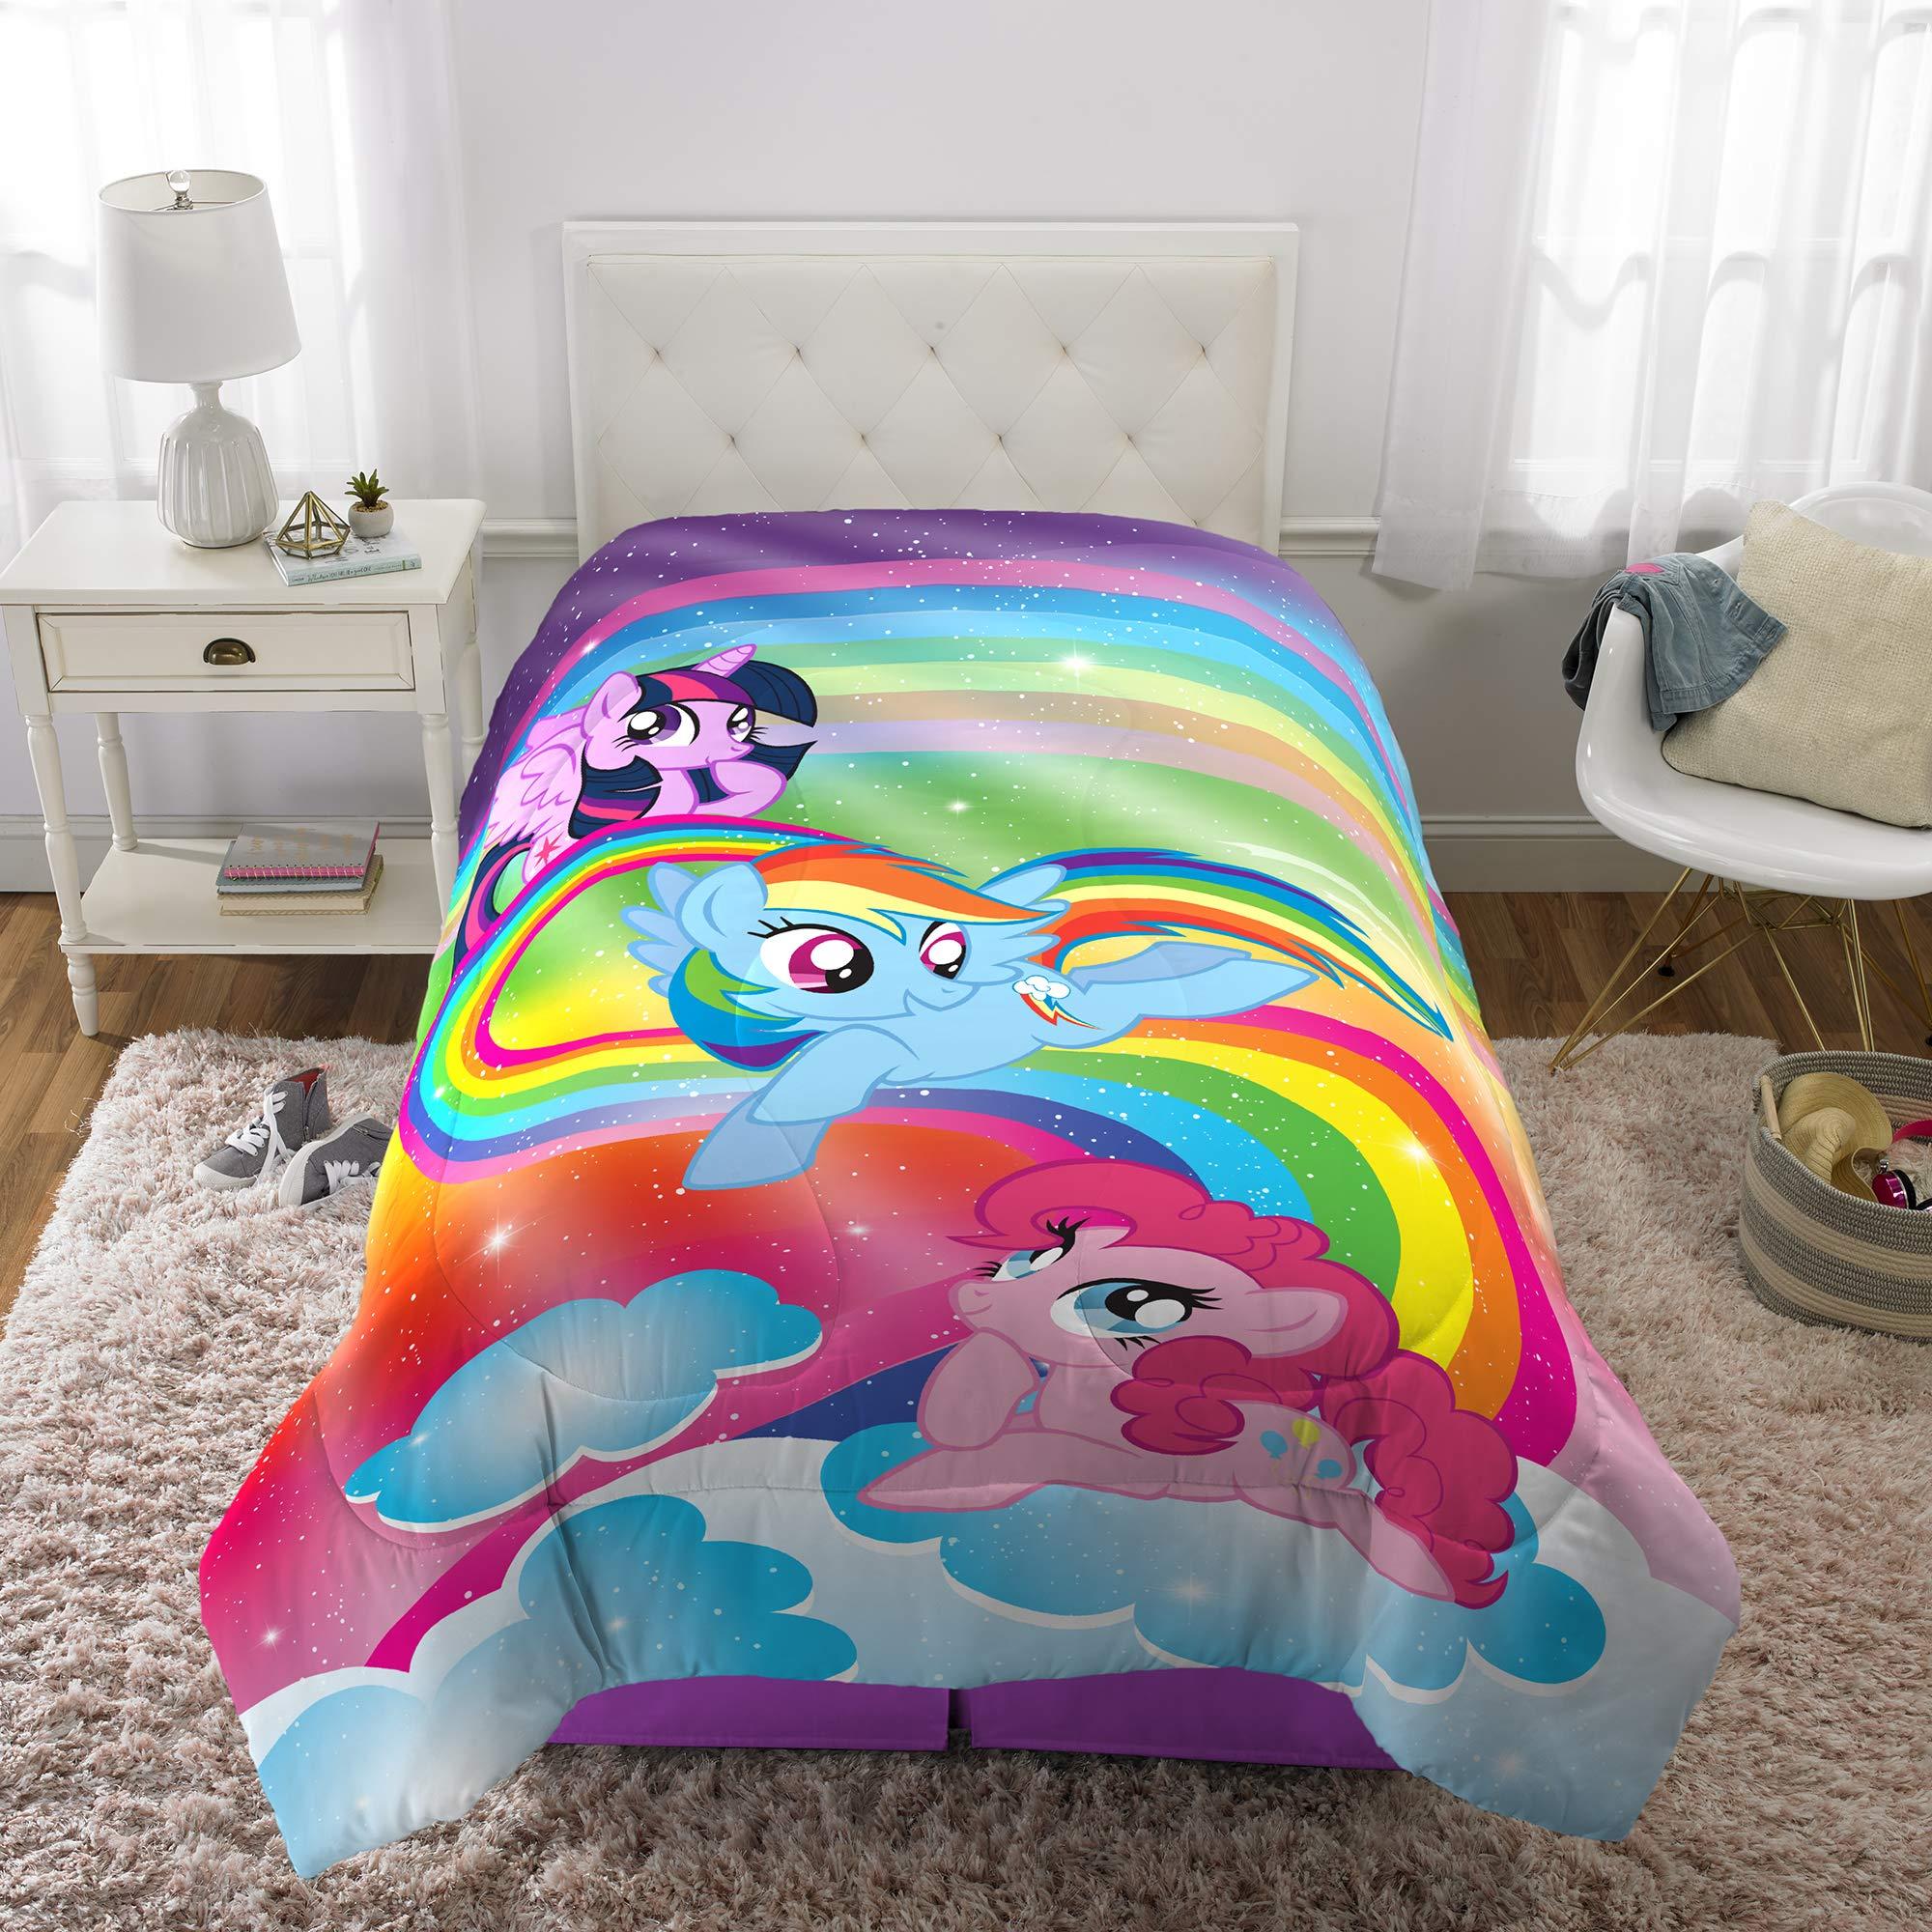 Franco Kids Bedding Super Soft Microfiber Reversible Comforter, Twin/Full Size 72'' x 86'', Hasbro My Little Pony